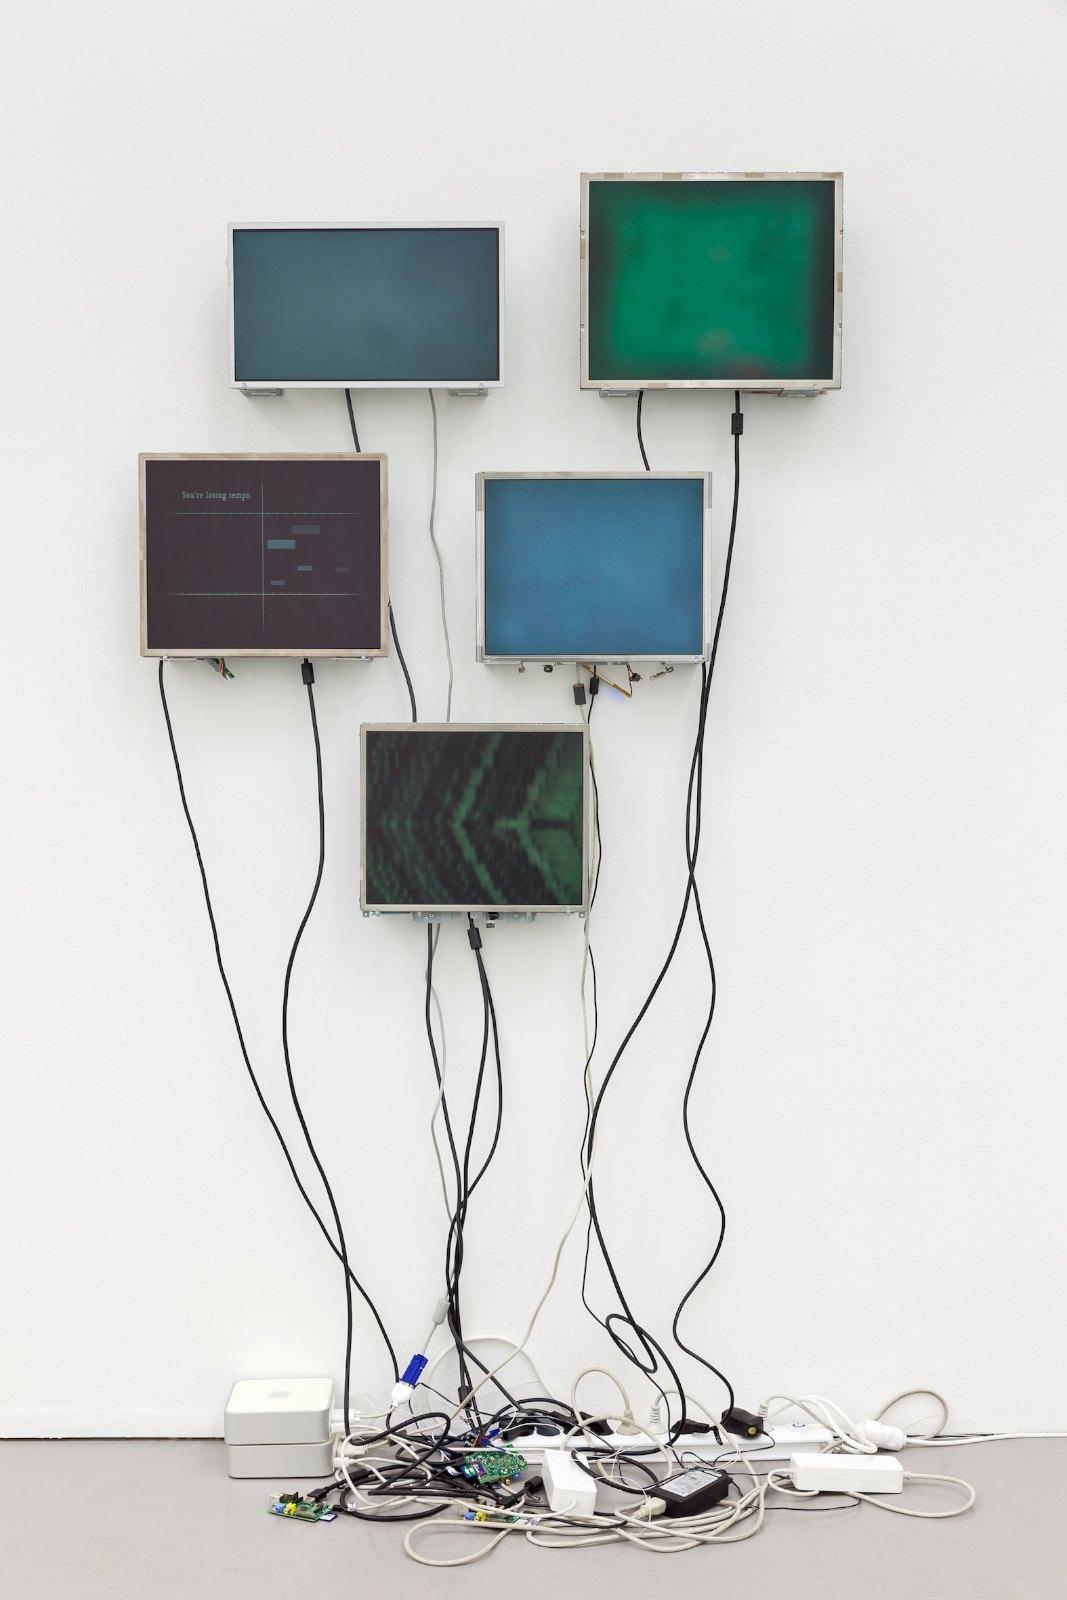 Grönt brus, 2013, video installation with sound: five monitors, three single-board computers, two Mac Mini, 203 x 110 x 20 cm